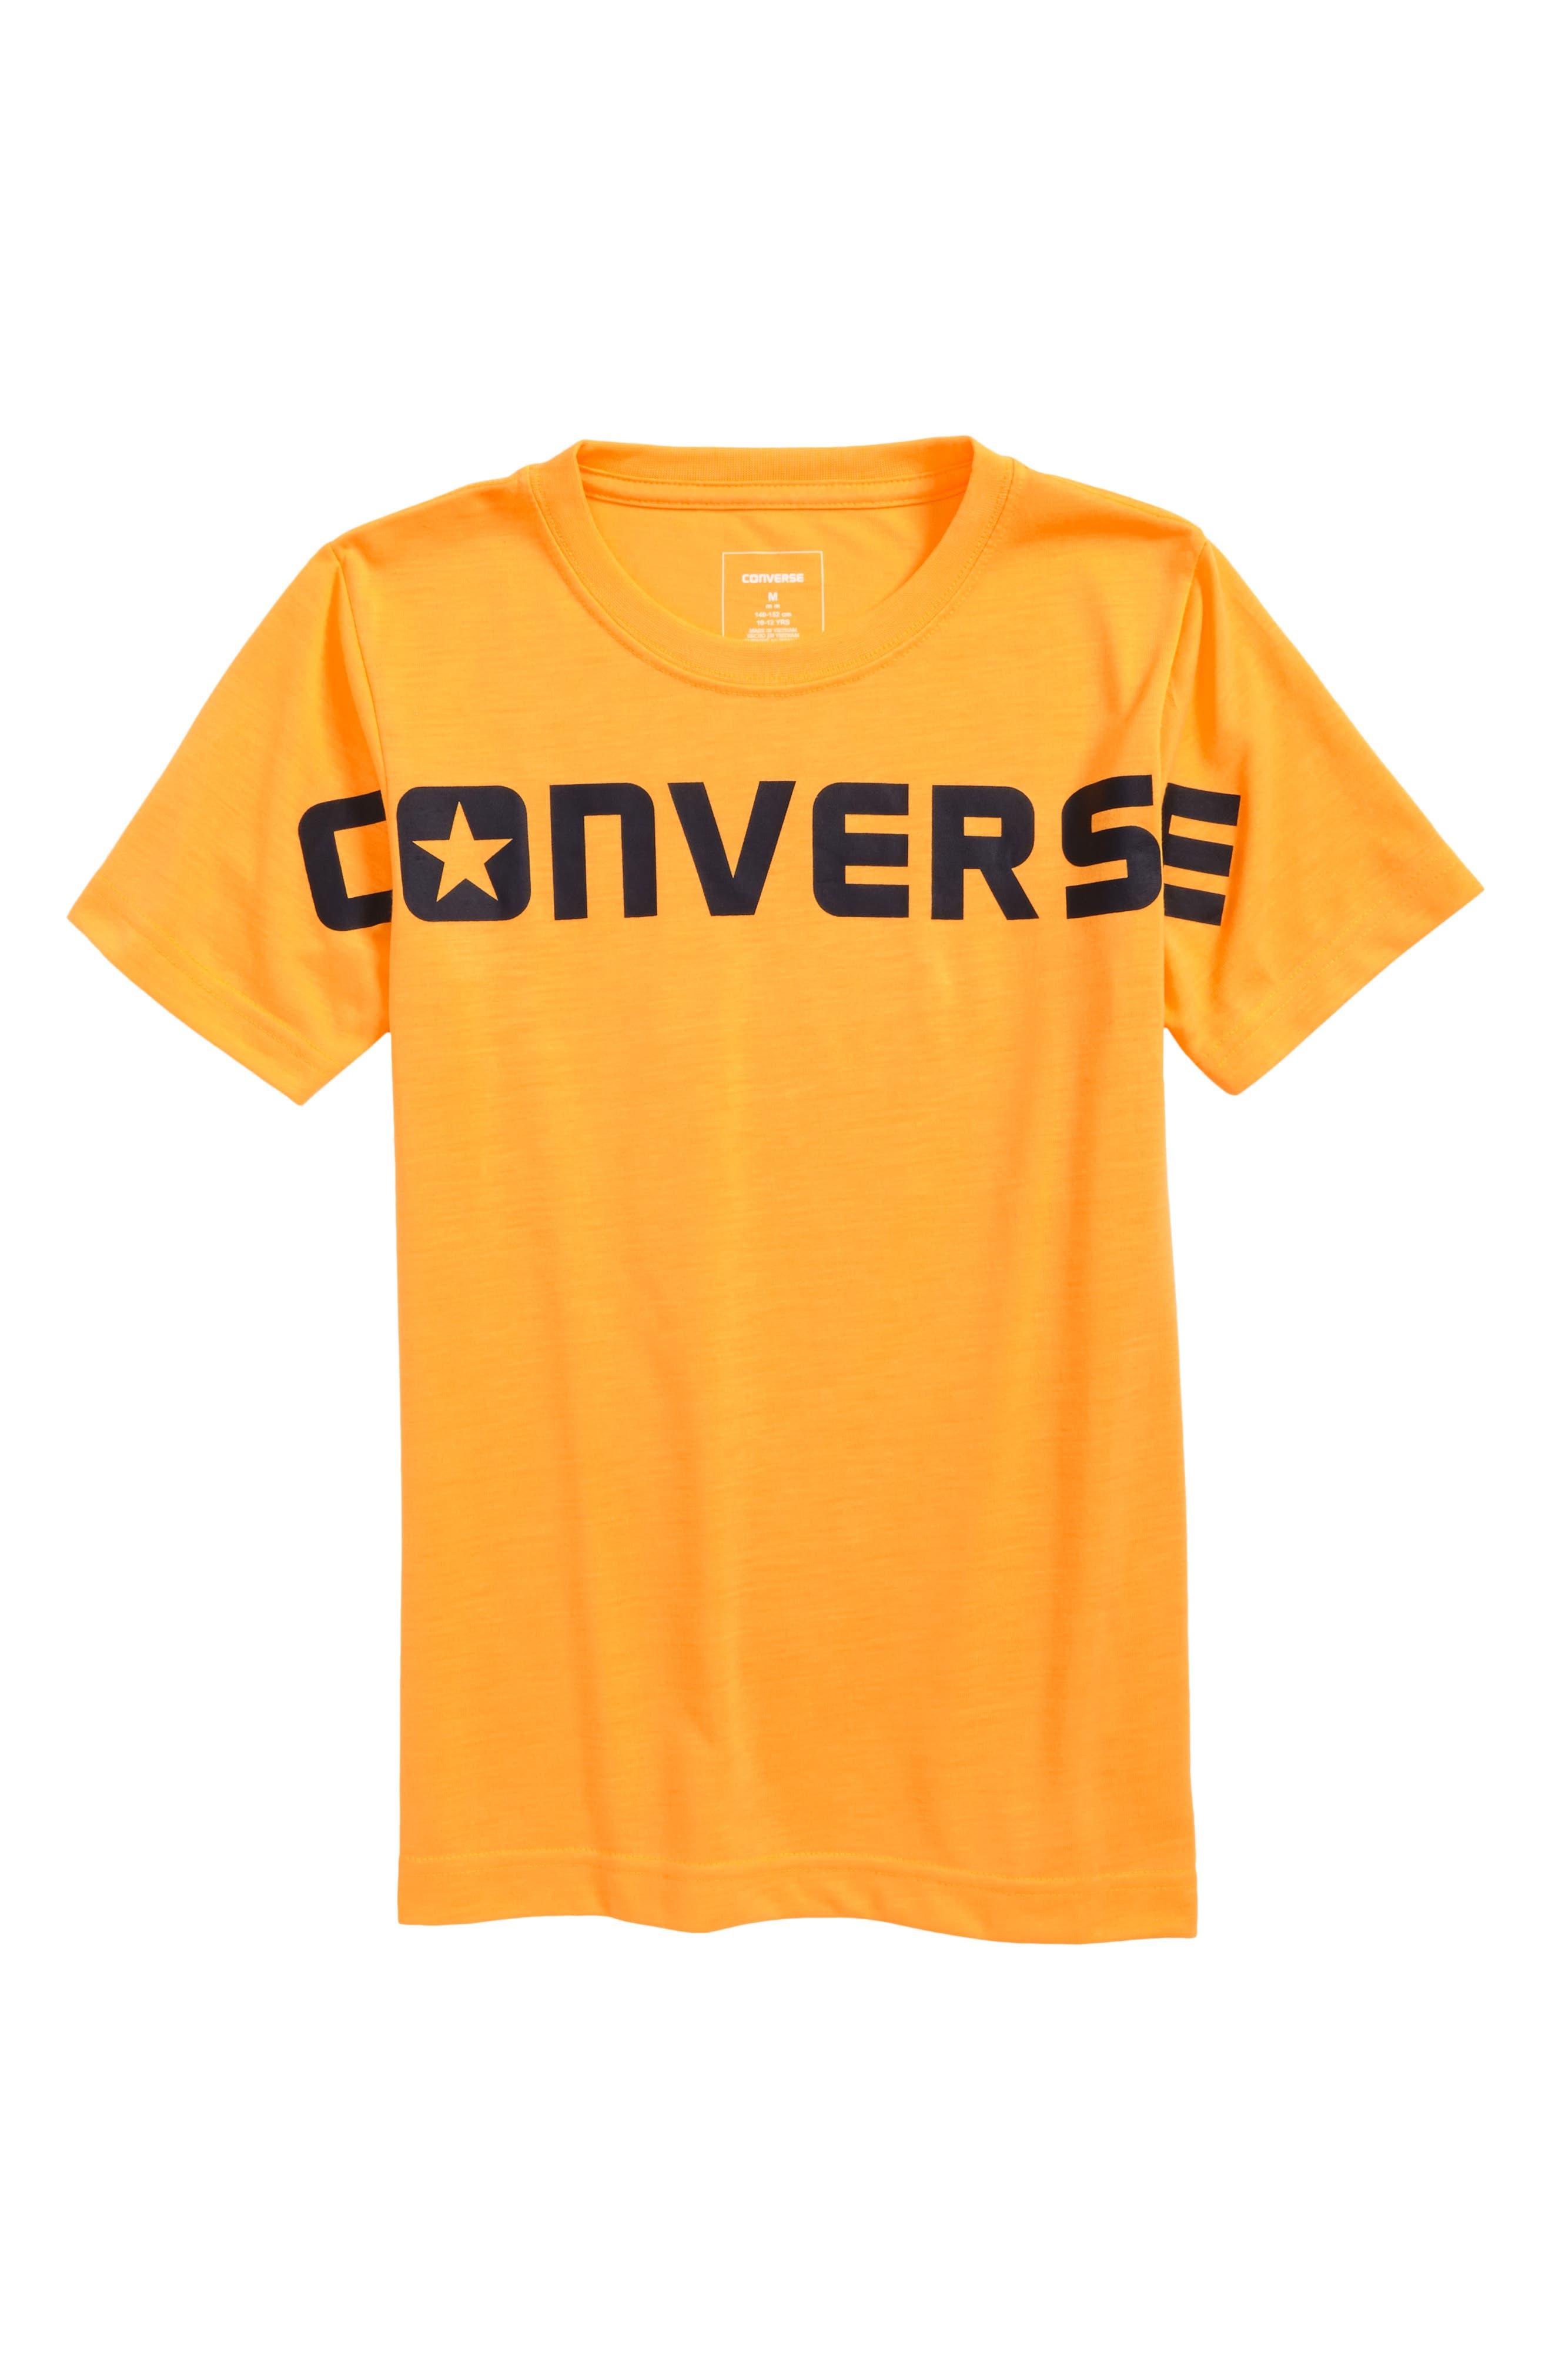 Alternate Image 1 Selected - Converse Wordmark Graphic T-Shirt (Big Boys)